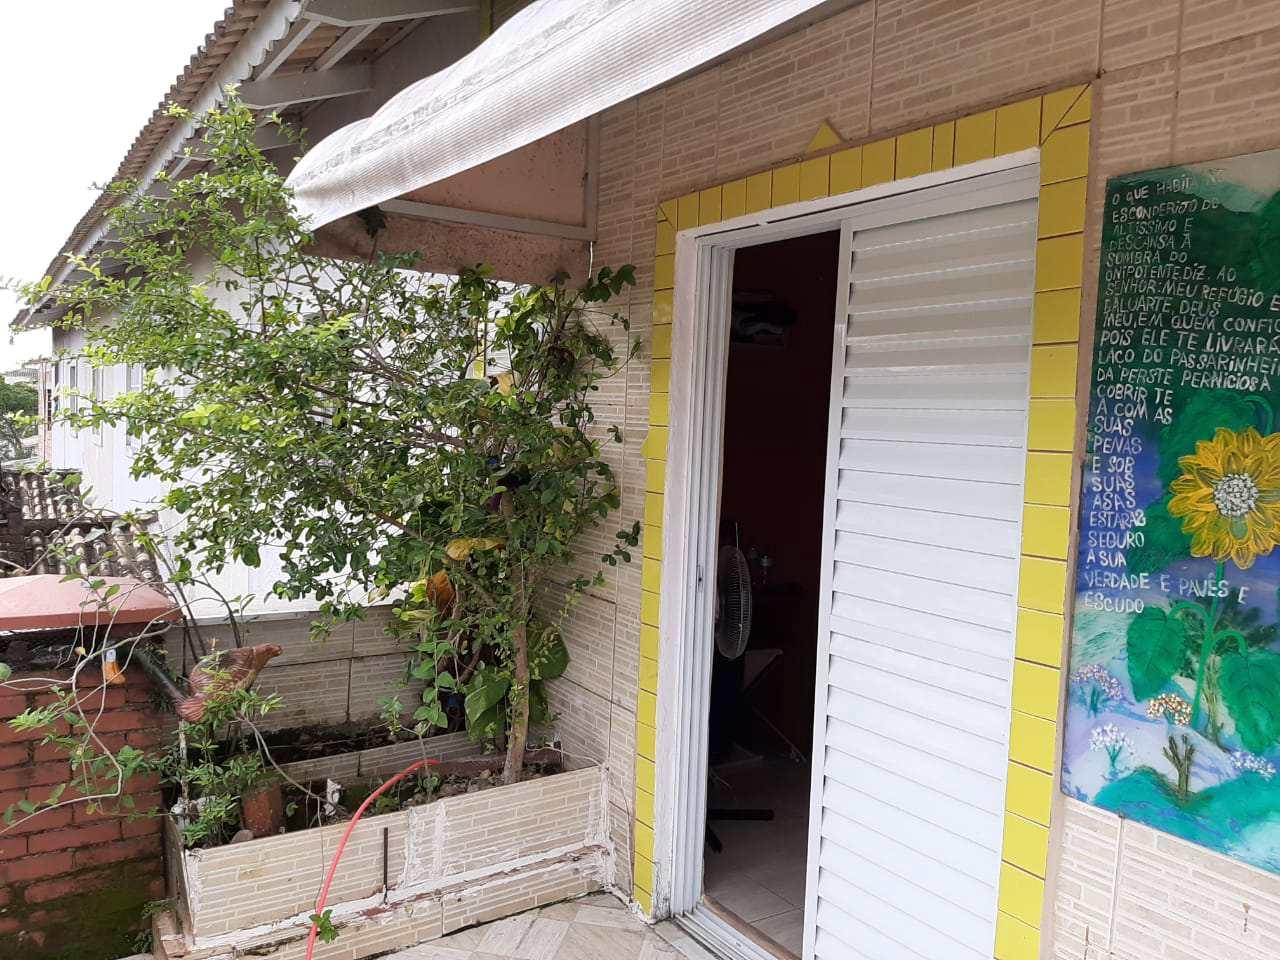 Sobrado com 2 dorms, Vera Stella, Mongaguá - R$ 200 mil, Cod: 286994